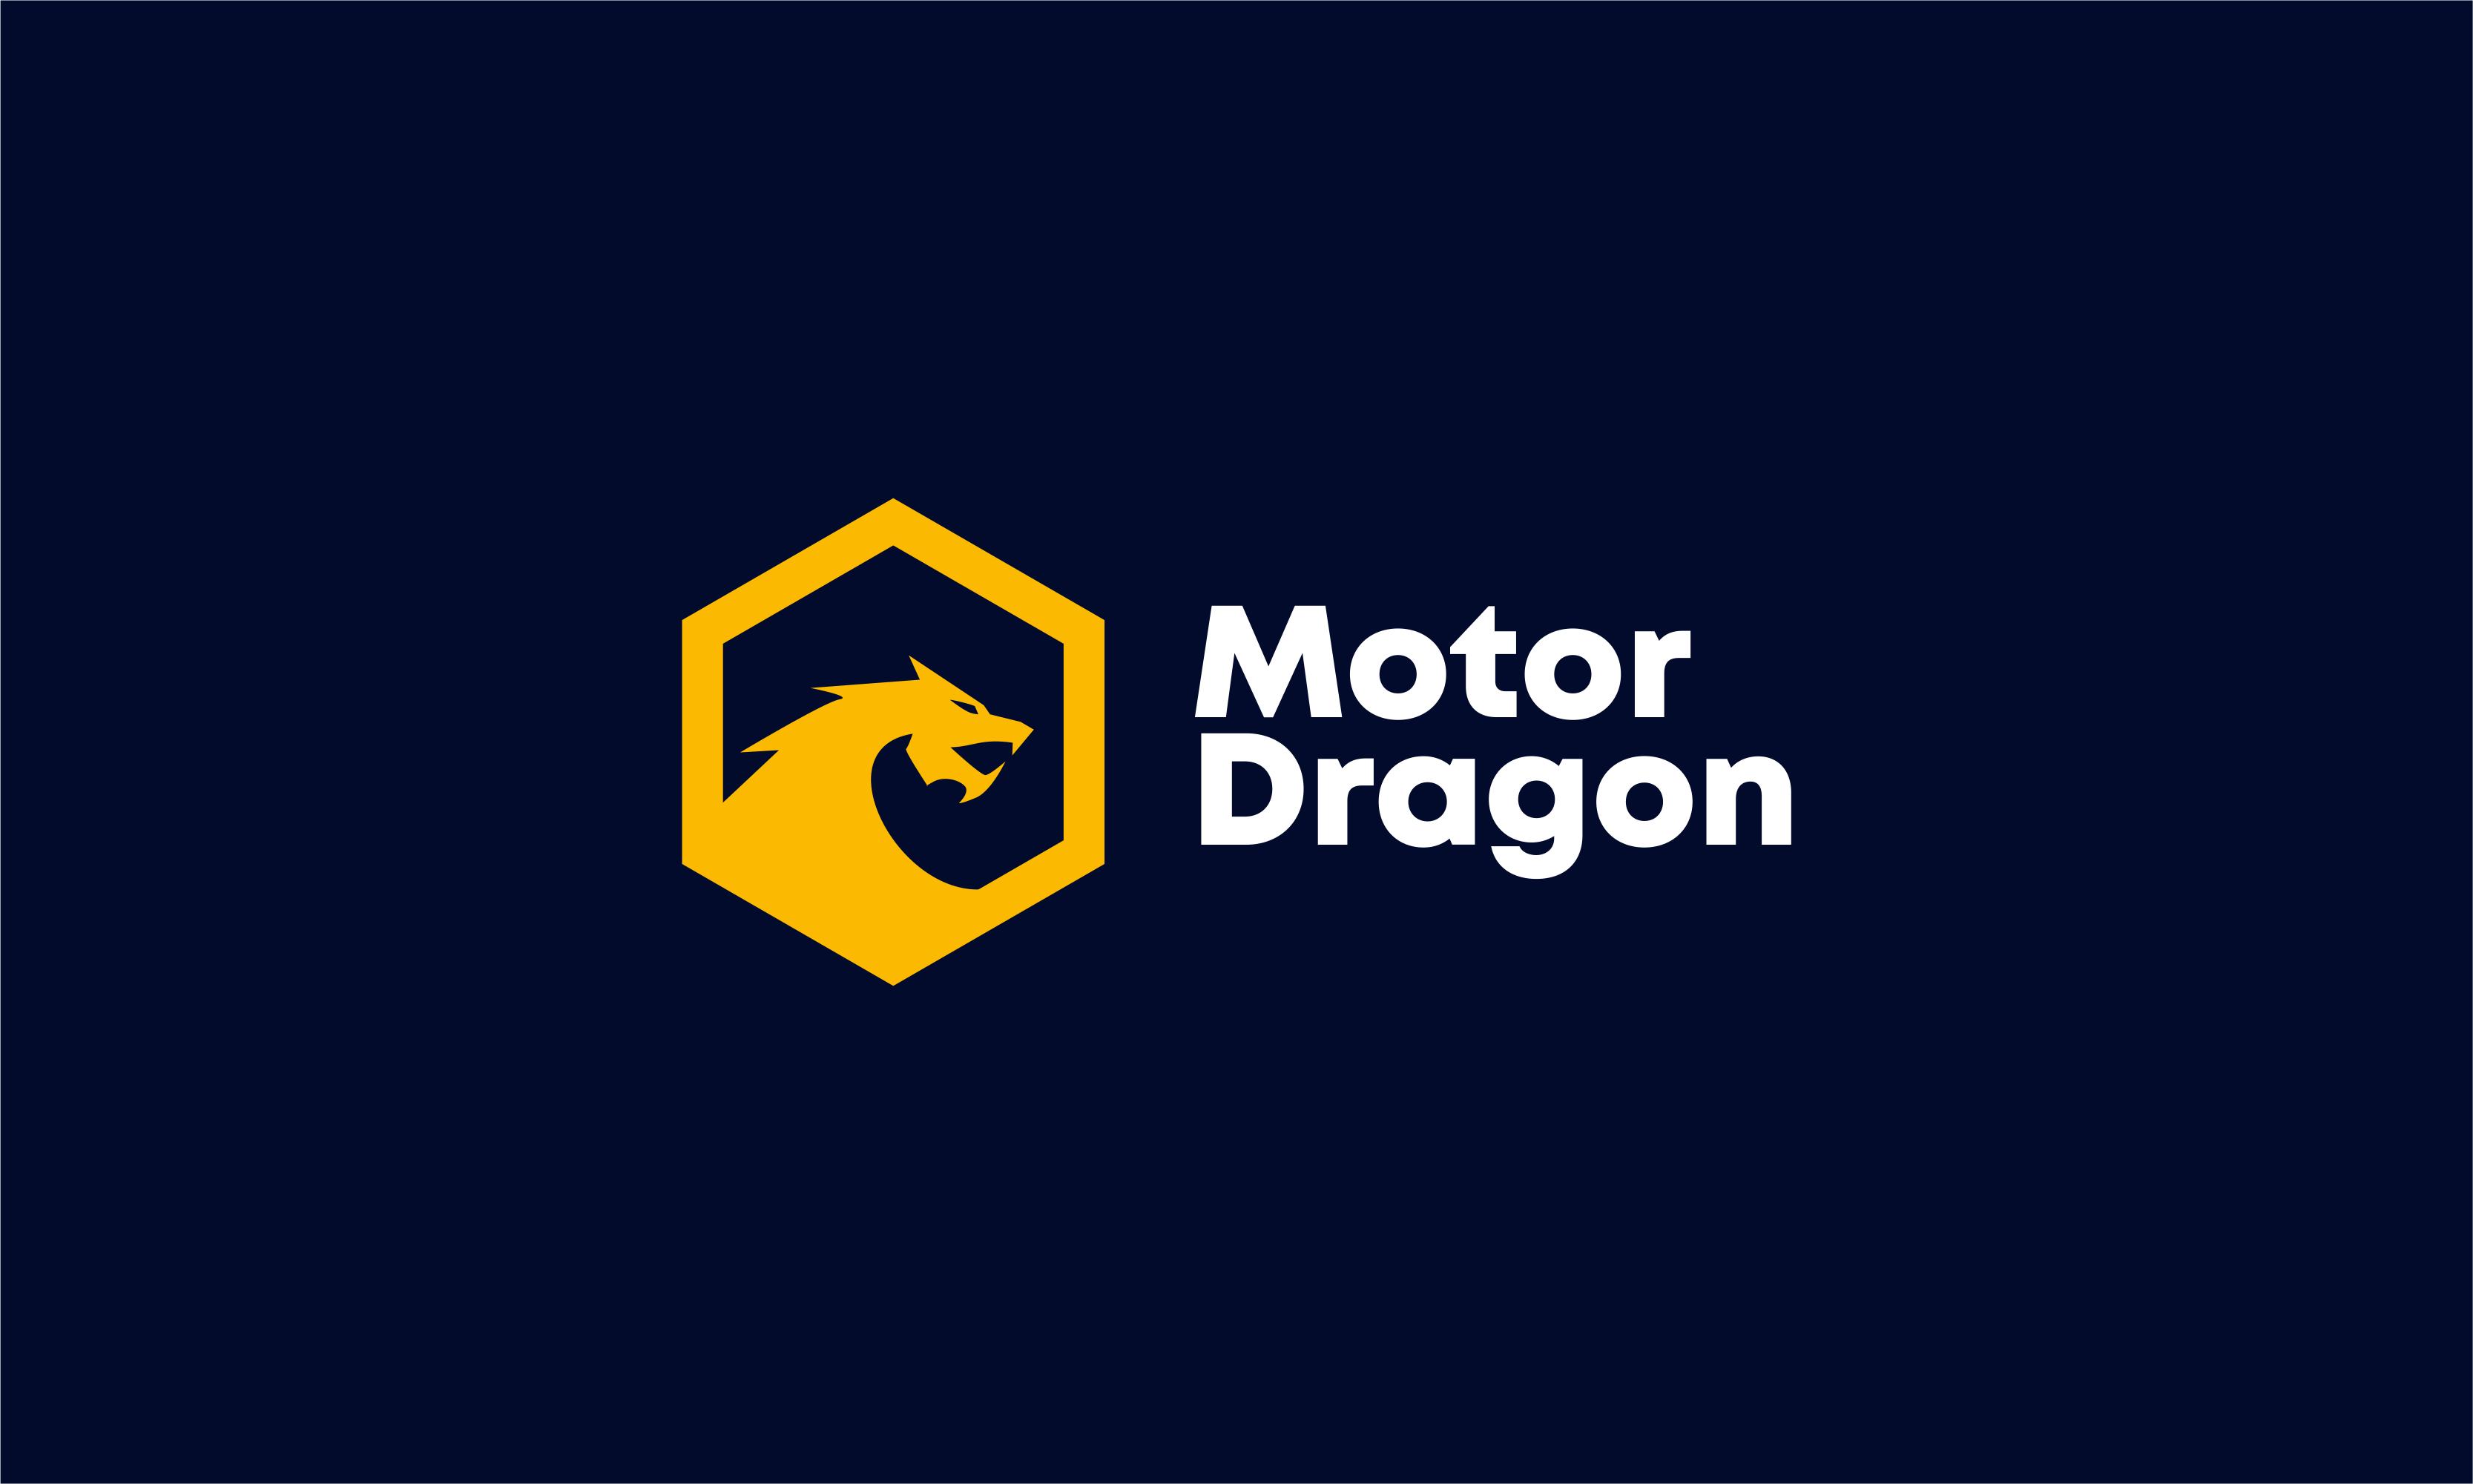 Motordragon